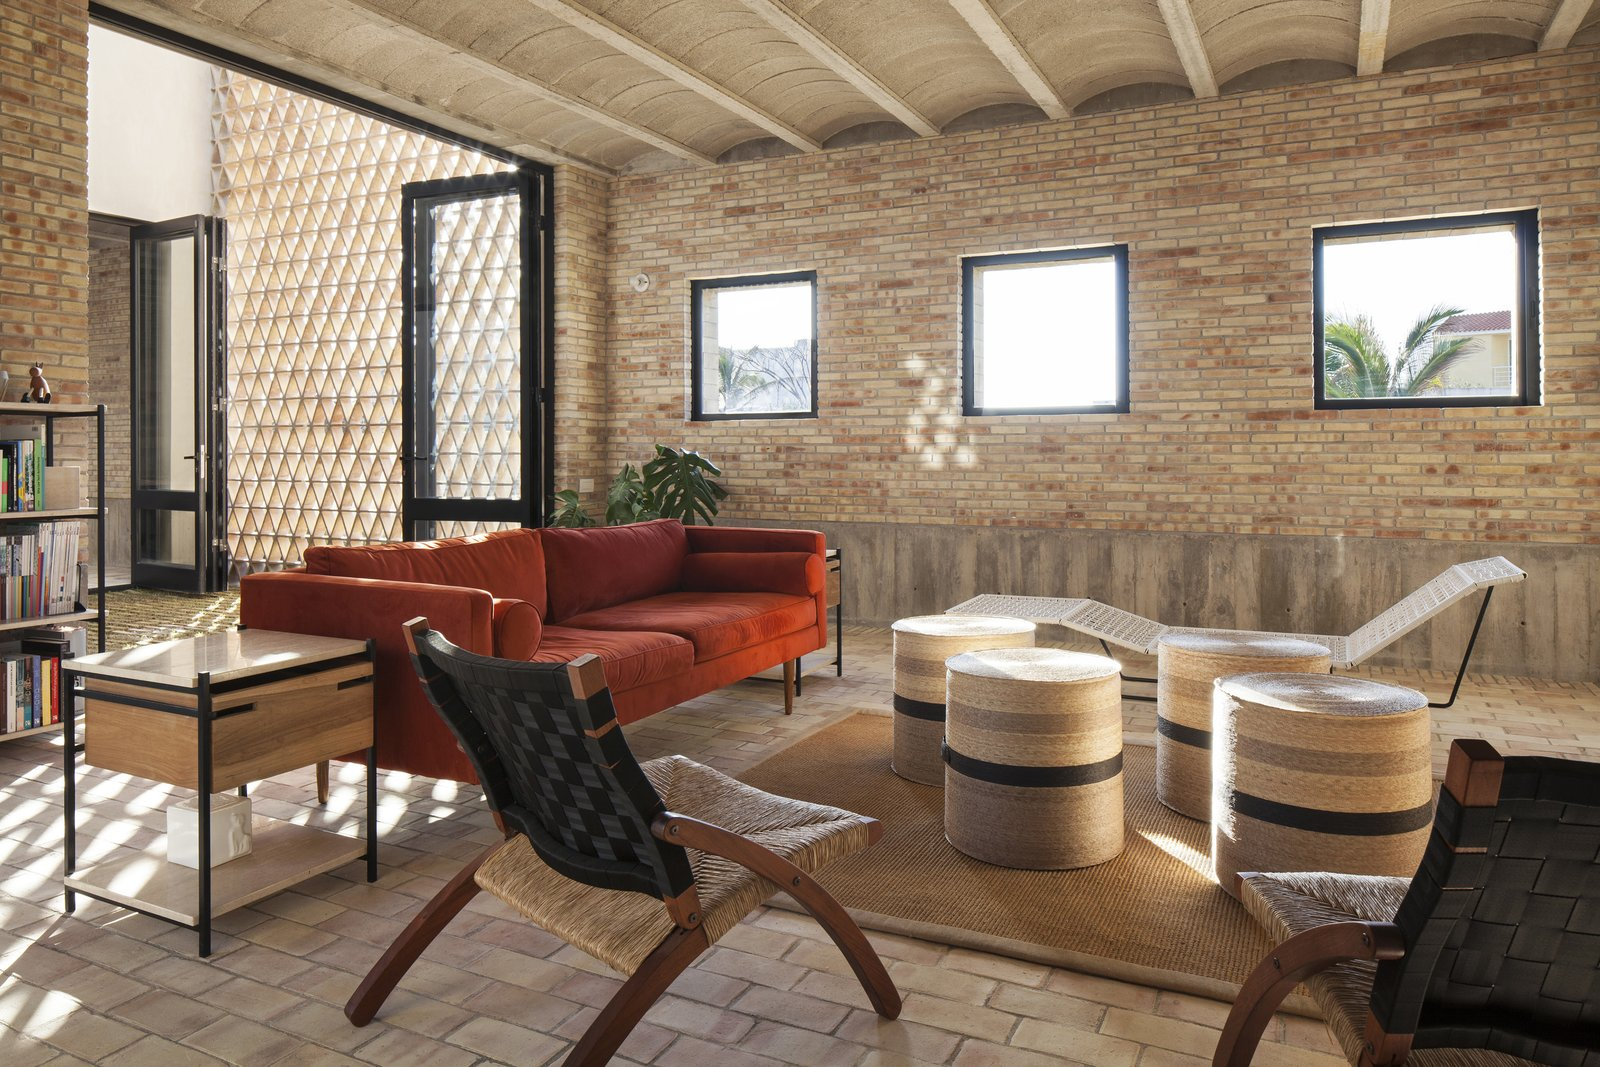 Living room. Tagged: Living Room and Terra-cotta Tile Floor. Casa Iguana by OBRA BLANCA